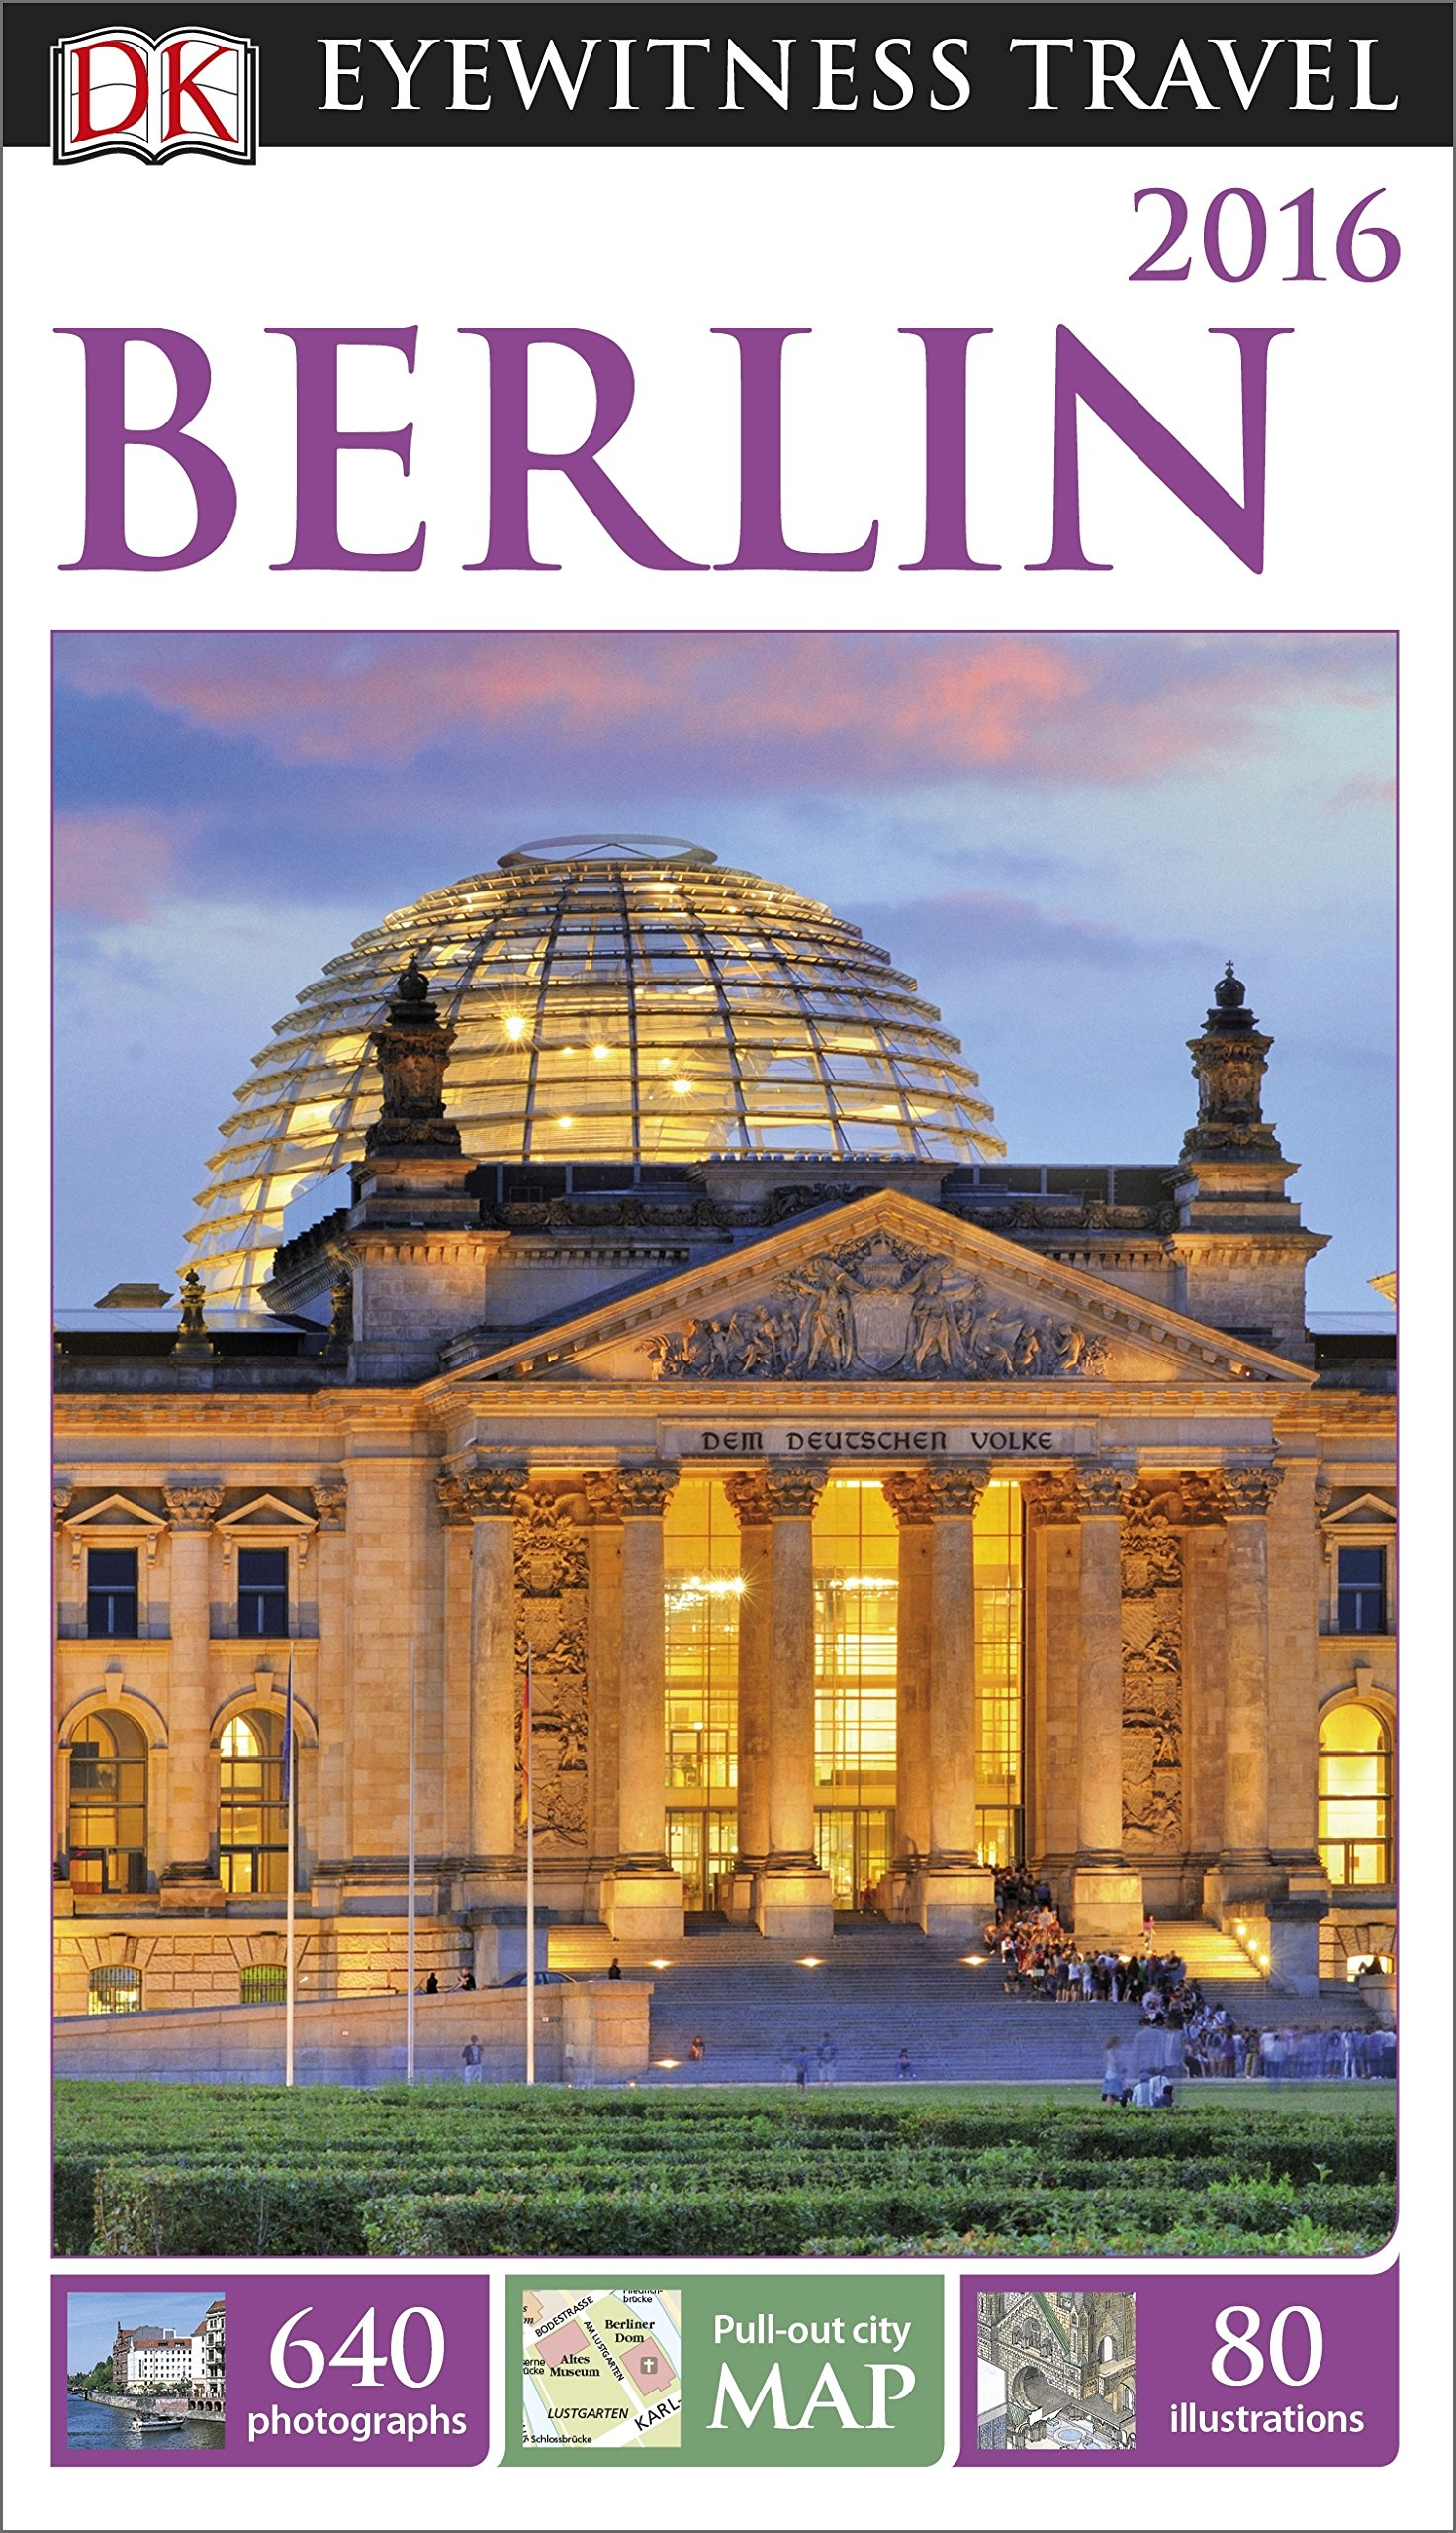 dk-eyewitness-travel-guide-berlin